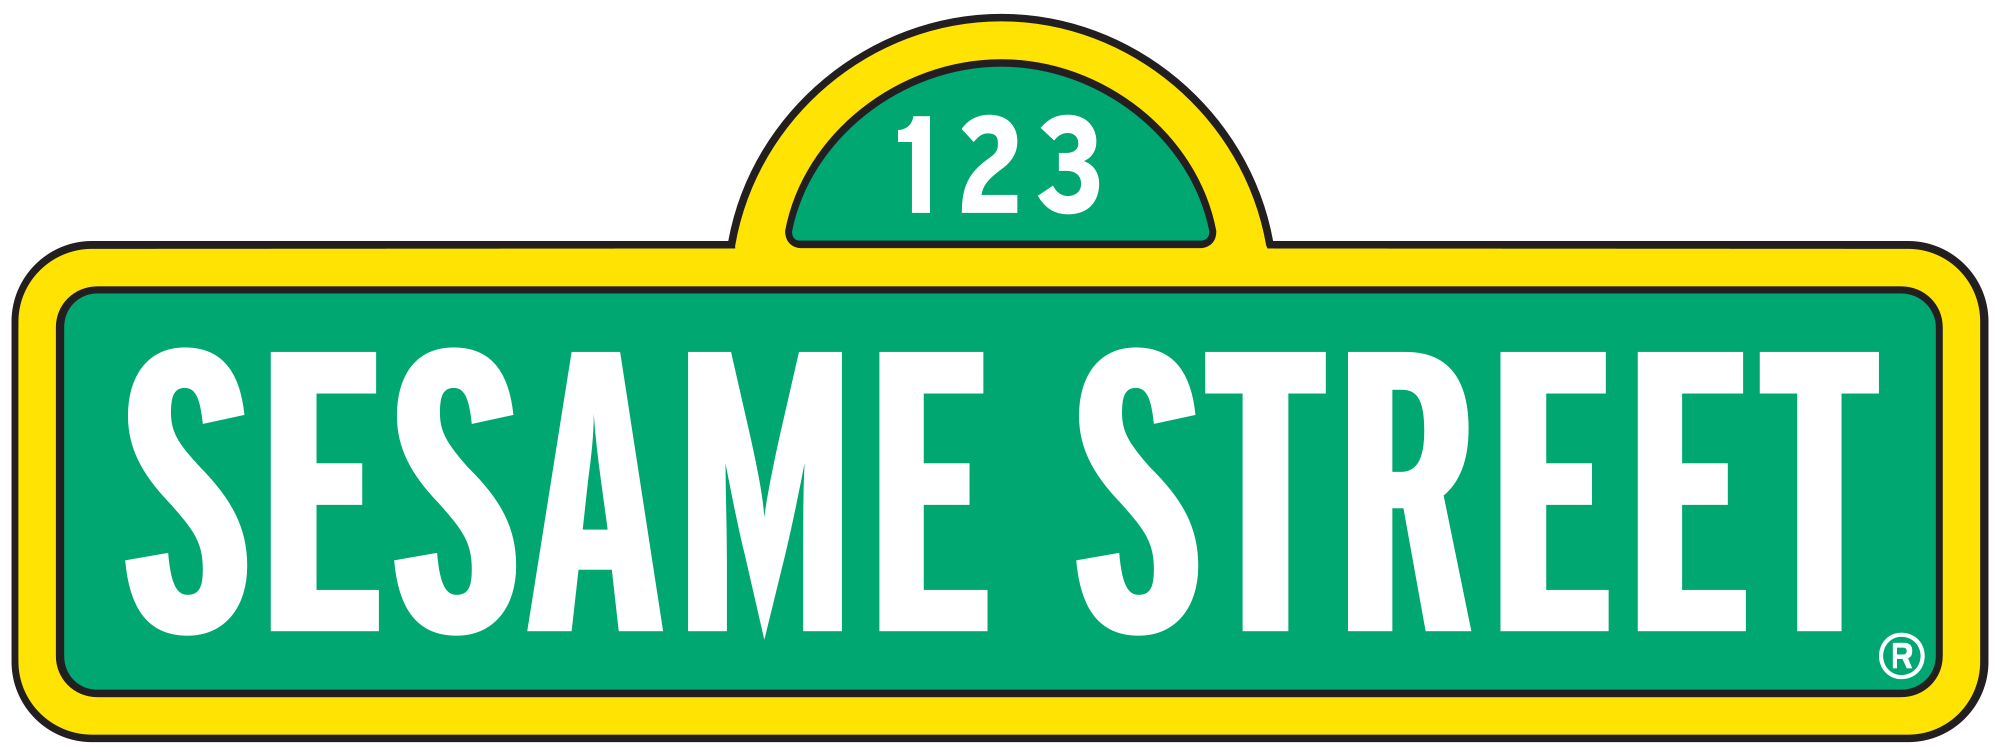 Street Sign Sesame Street Signs Sesame Street Birthday Sesame Street Party